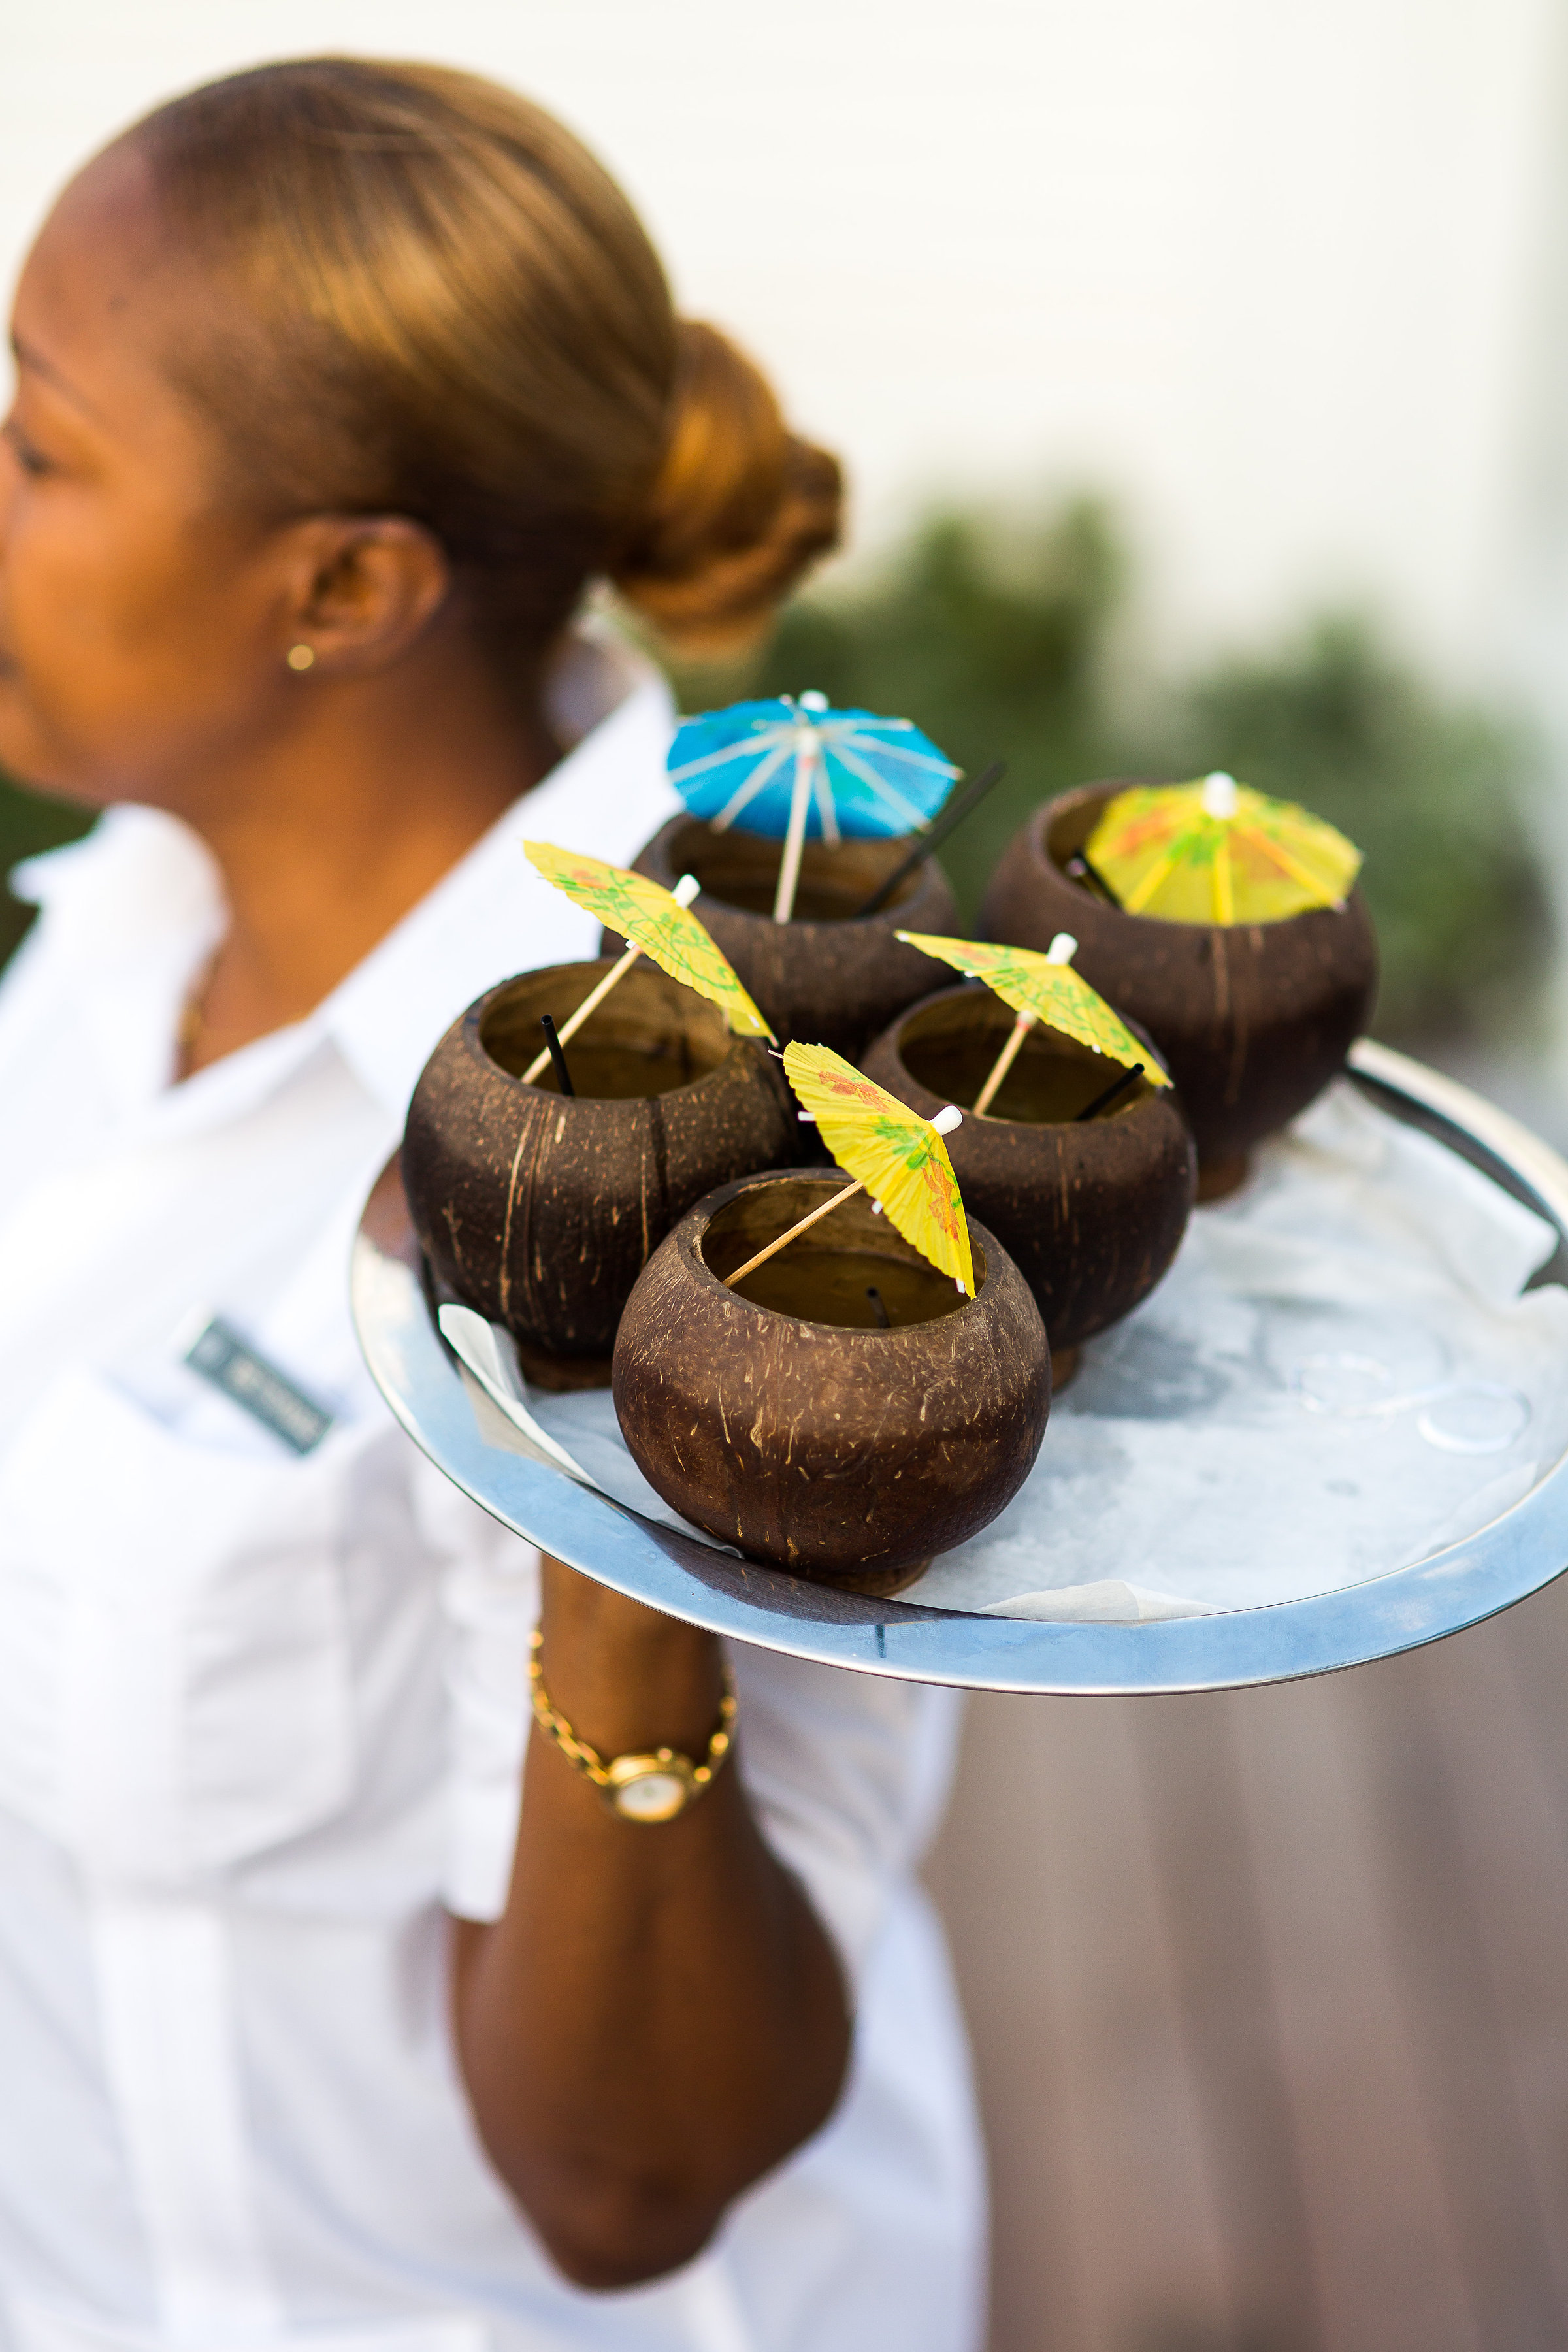 Ceci_New_York_Ceci_Style_Ceci_Johnson_Luxury_Lifestyle_Destination_Bahamas_Wedding_Letterpress_Inspiration_Design_Custom_Couture_Personalized_Invitations_28.jpg